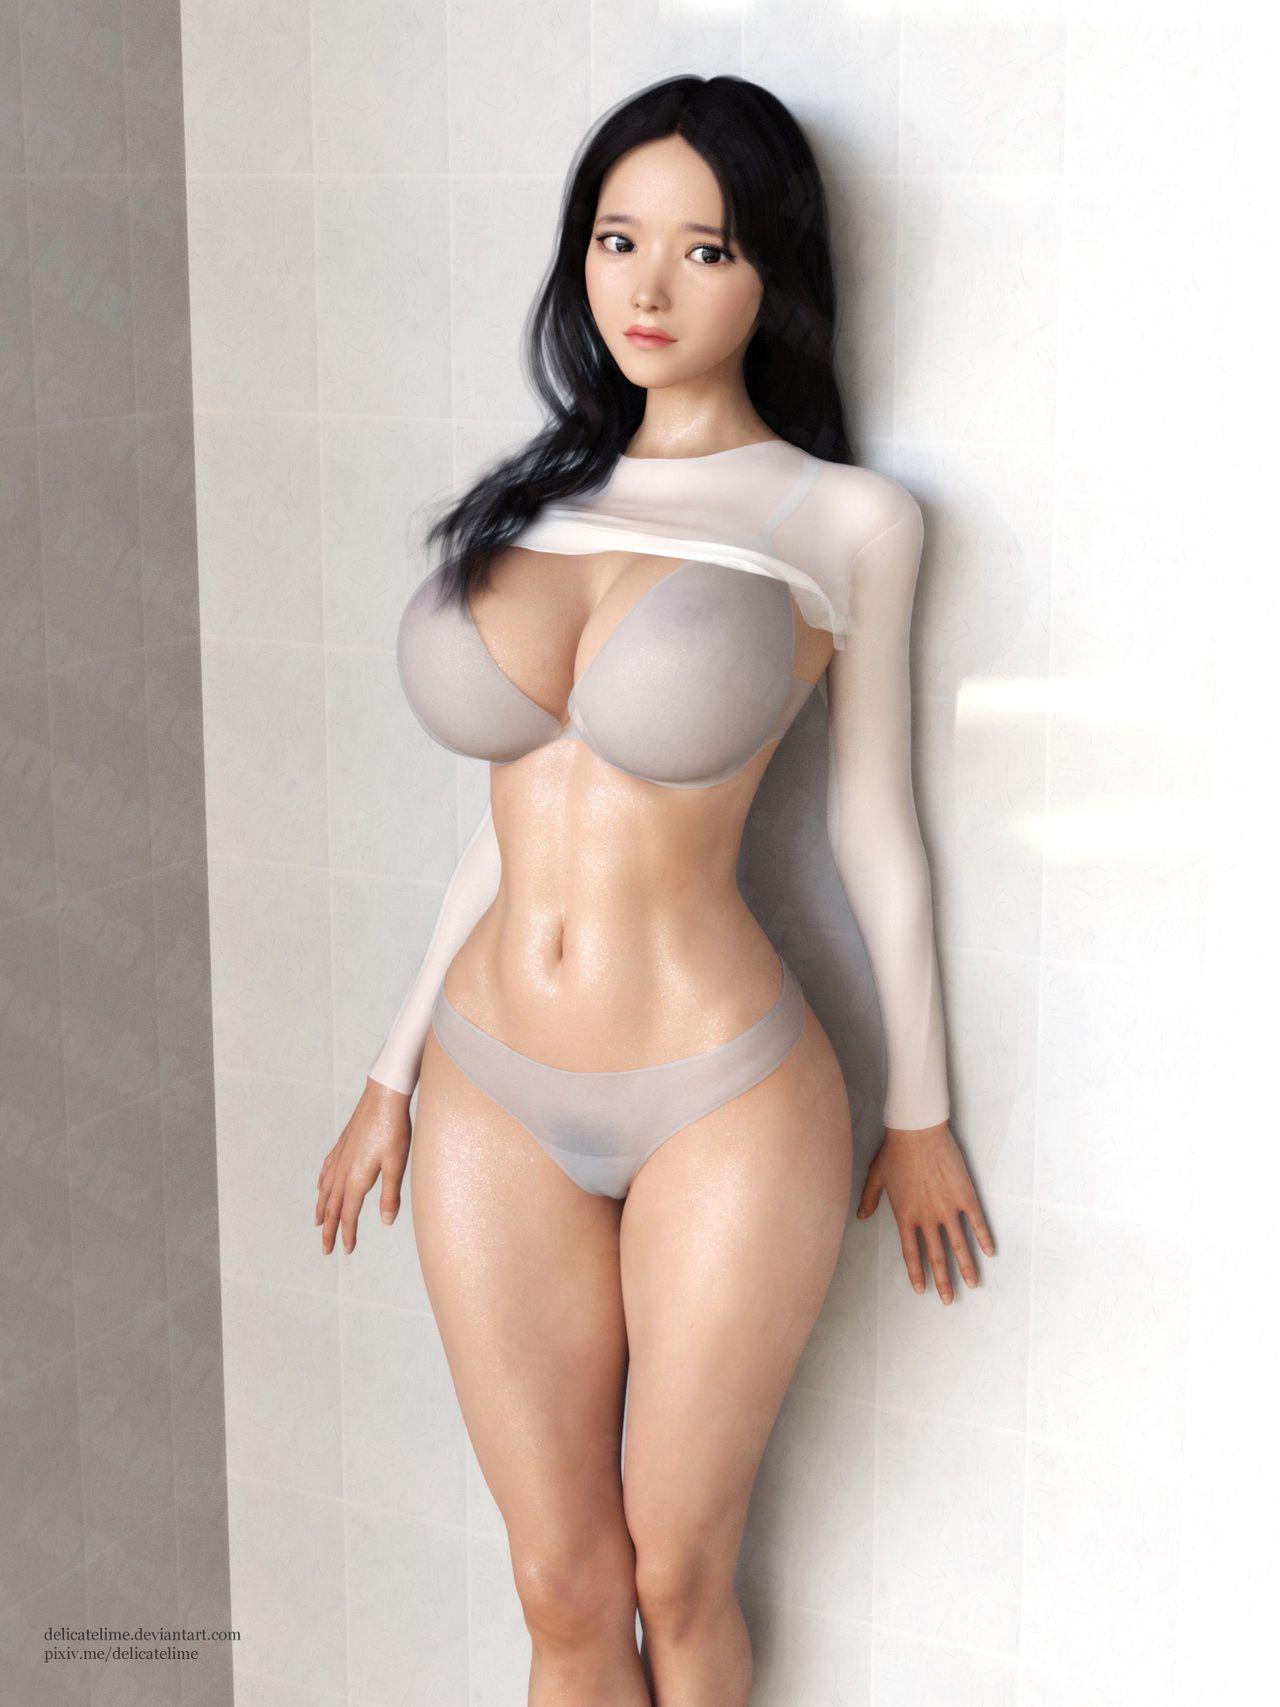 画师Delicatelime 3D唯美作品-FANCHENBIZ